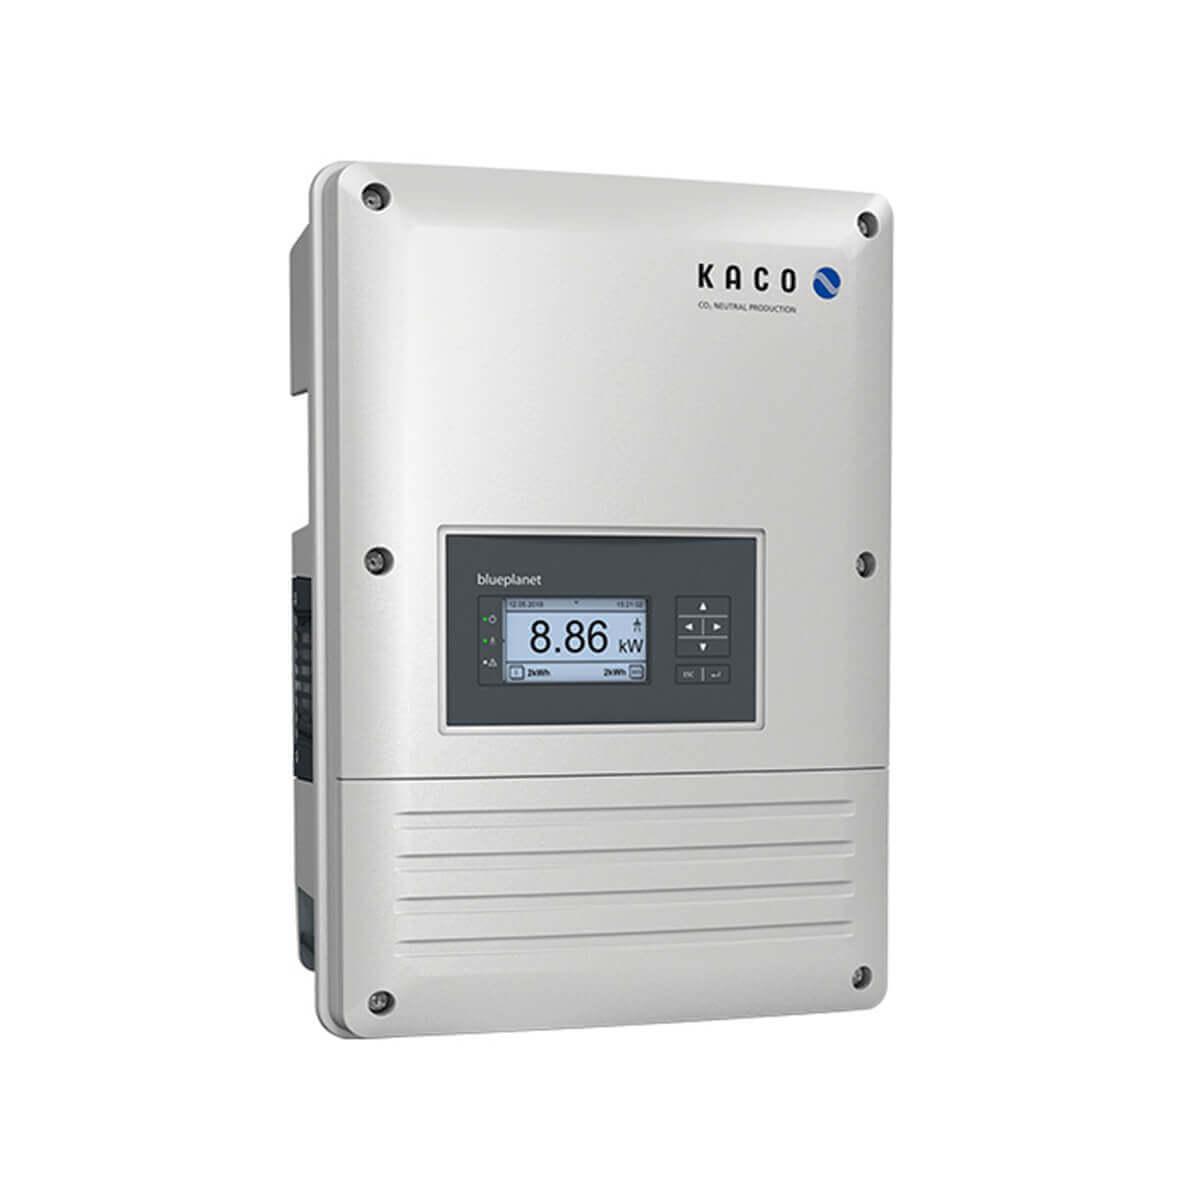 kaco 6.5kW inverter, kaco blueplanet 6.5kW inverter, kaco blueplanet 6.5tl3 inverter, kaco blueplanet 6.5tl3, kaco blueplanet 6.5 kW, KACO 6.5 KW